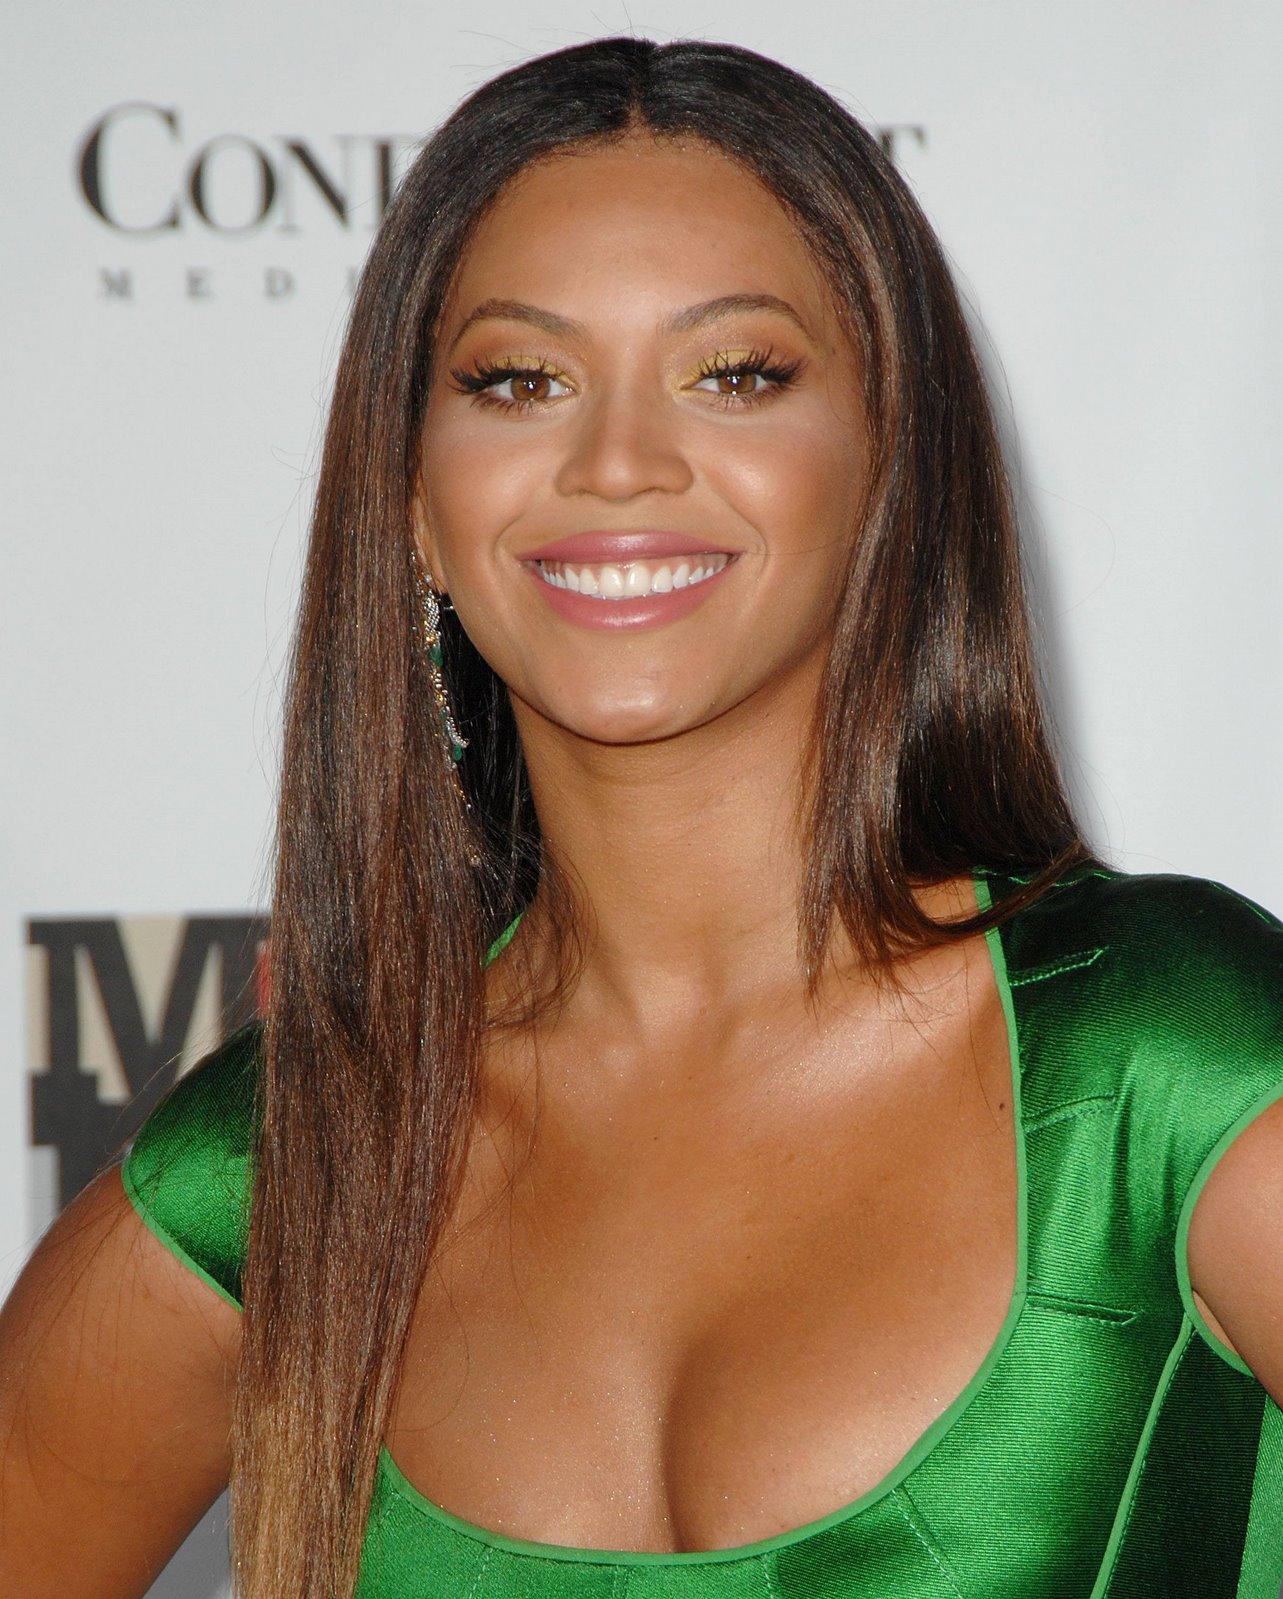 http://2.bp.blogspot.com/_2J0zHNa4gDo/R1RkUEk_kII/AAAAAAAABbA/KzFjtfpVGc0/s1600-R/celebutopia_Beyonce_Knowles_-_Movies_Rock_021207_04.jpg